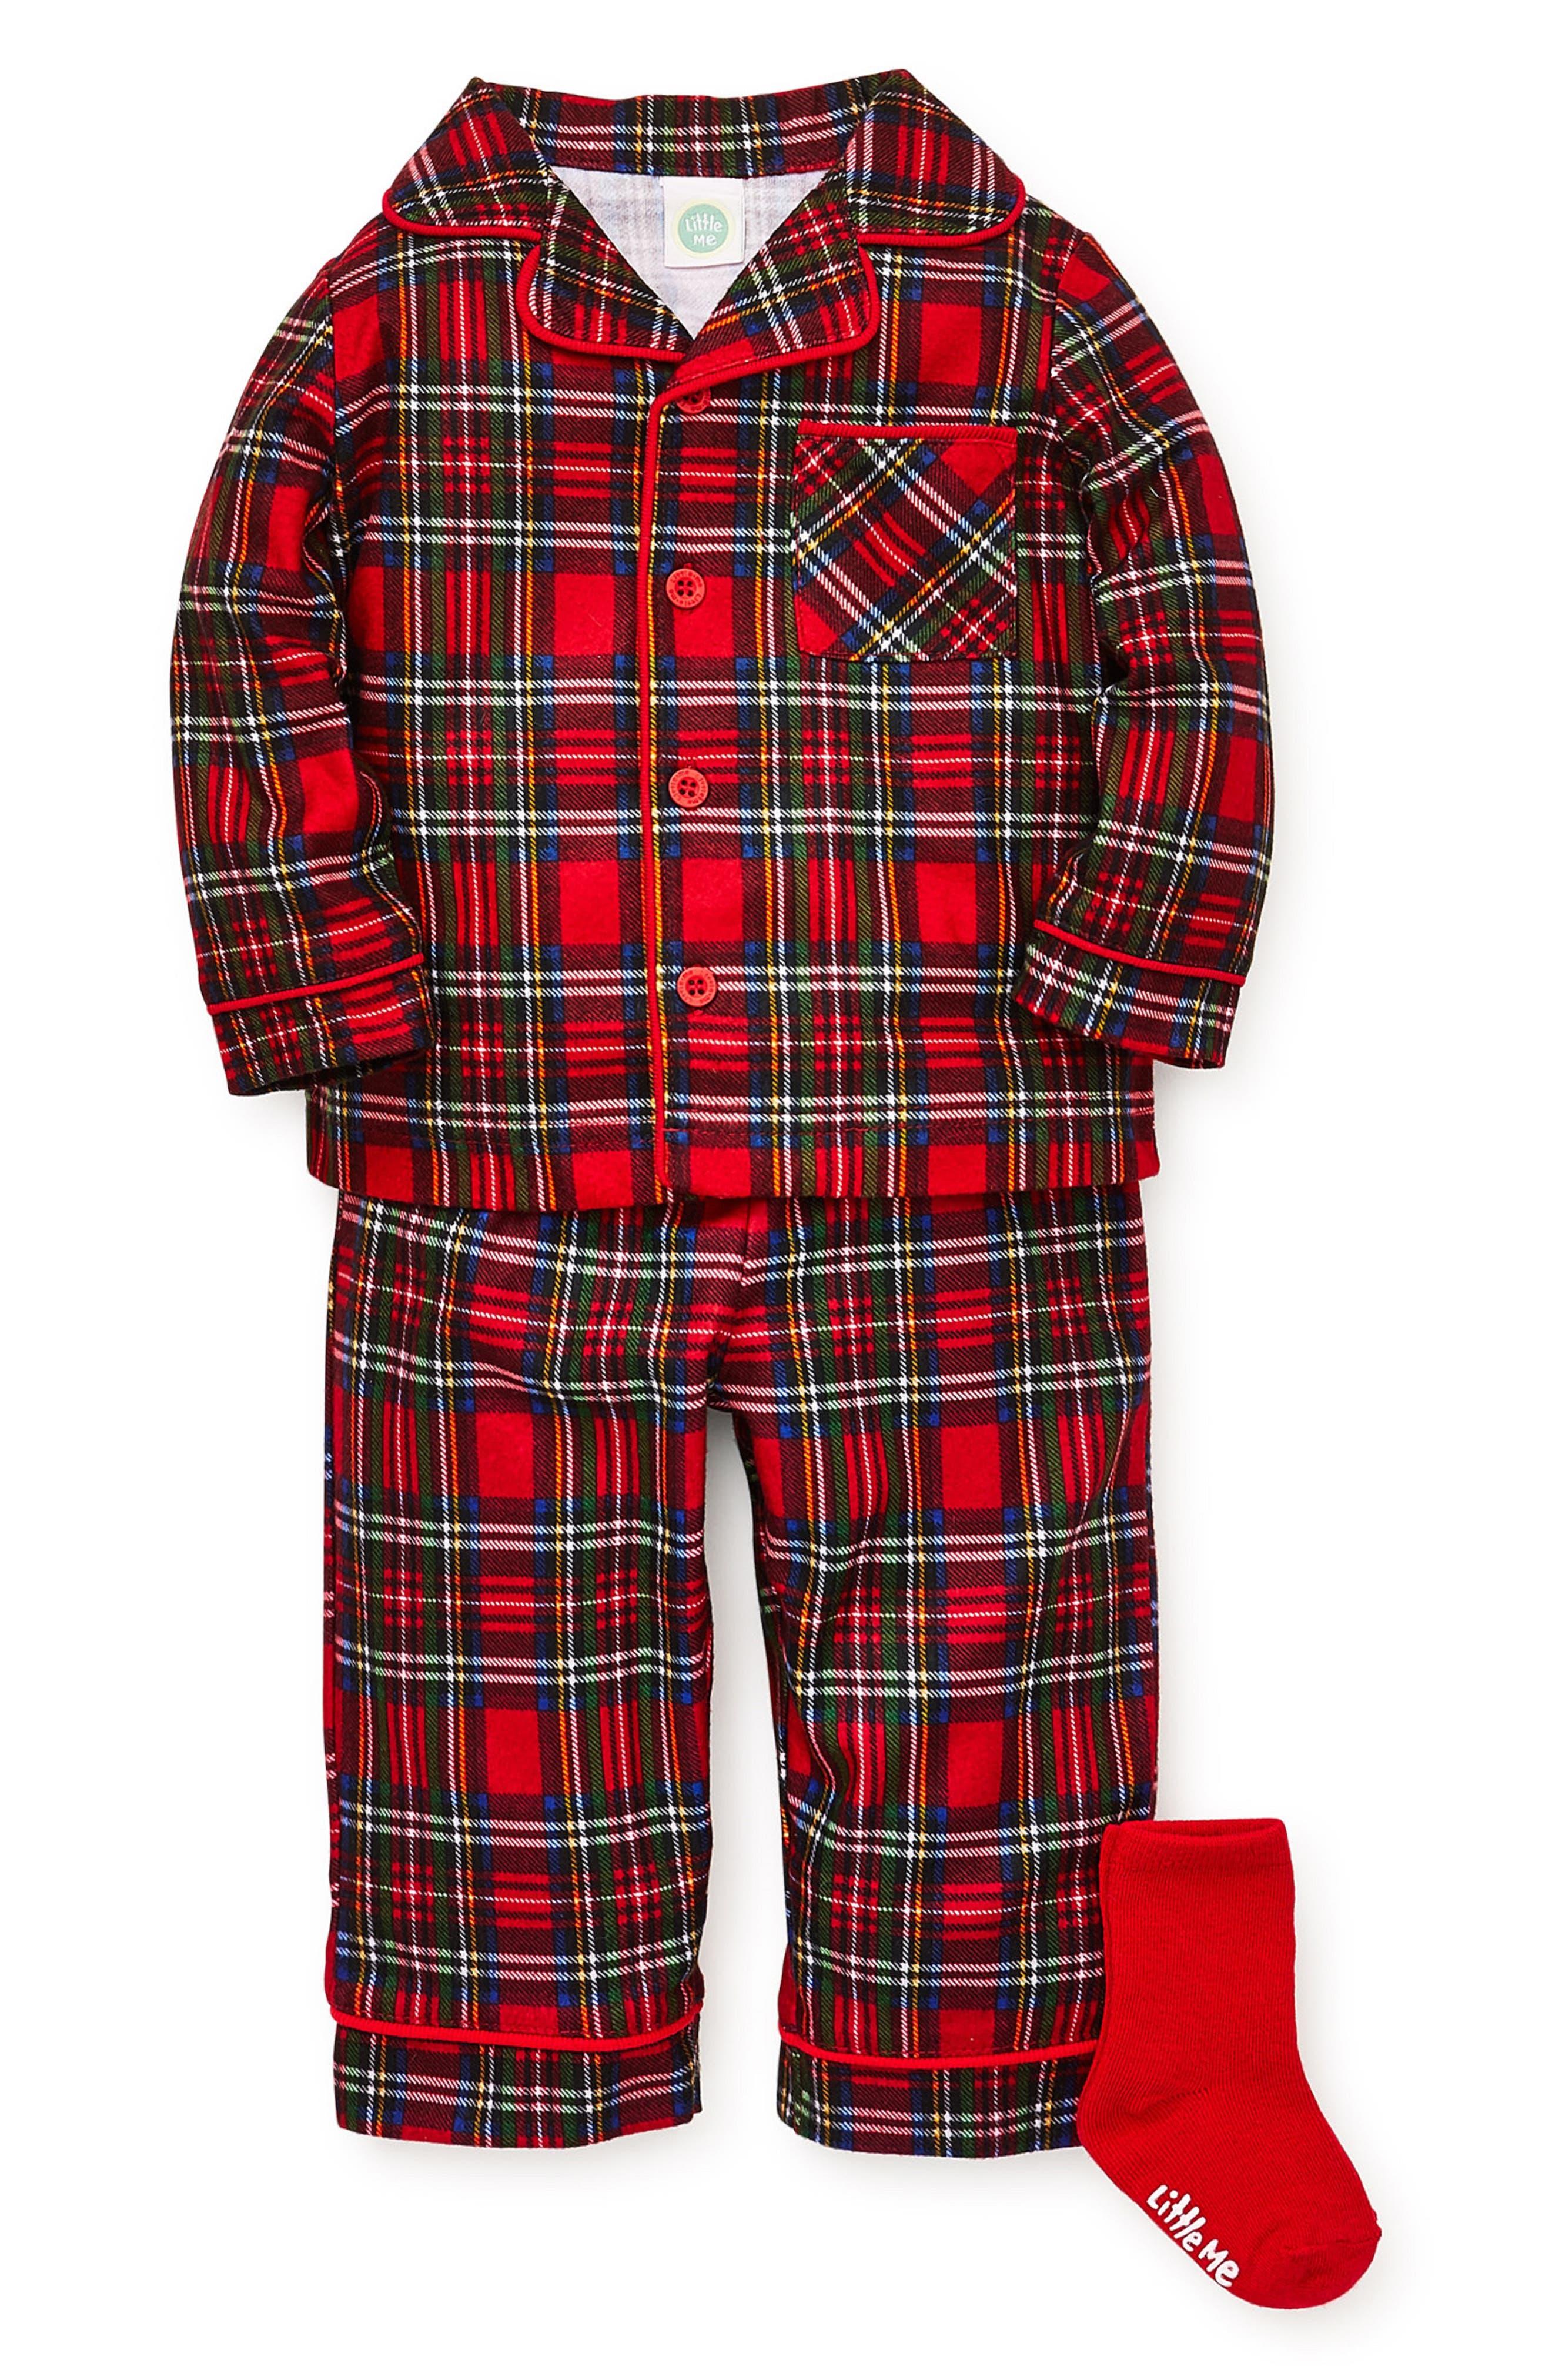 Toddler Boys Little Me Plaid TwoPiece Pajamas  Socks Set Size 4T  Red